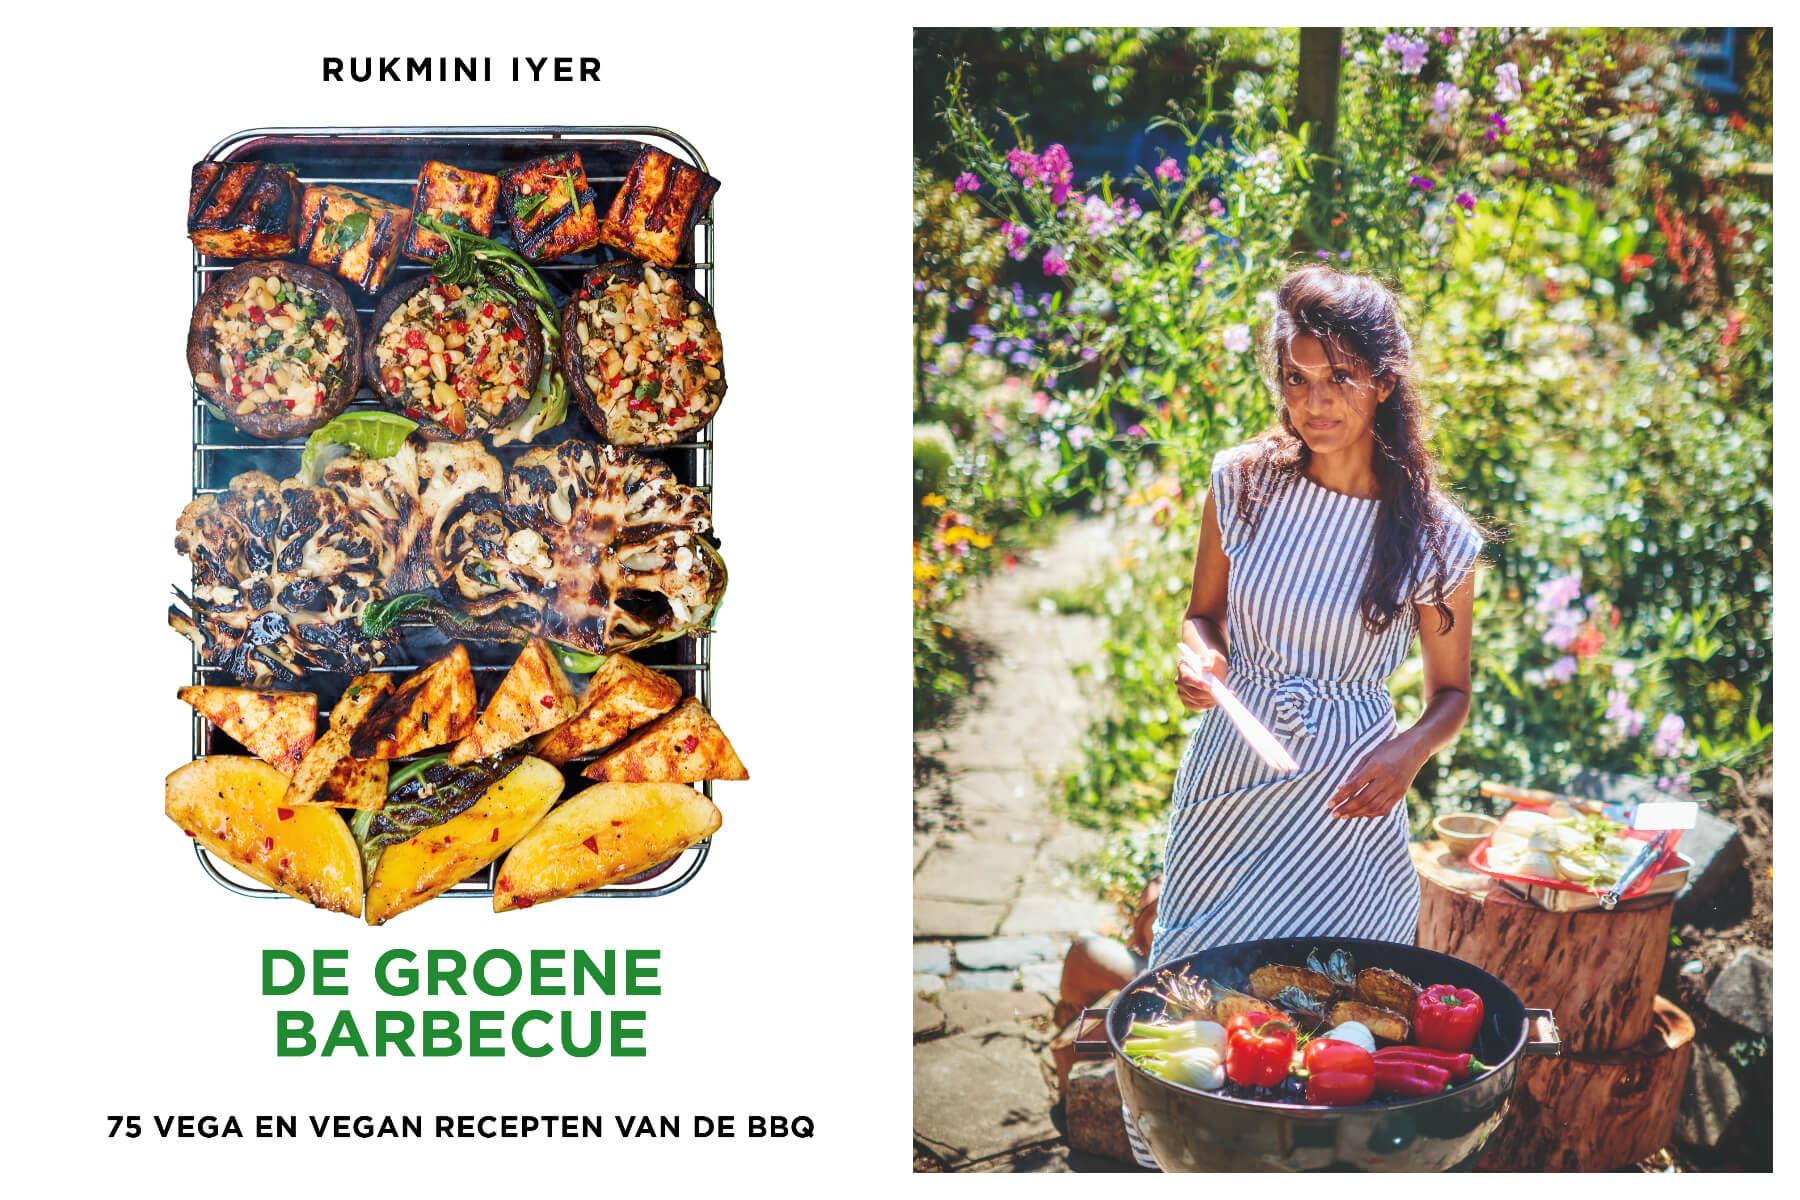 REVIEW: De groene barbecue